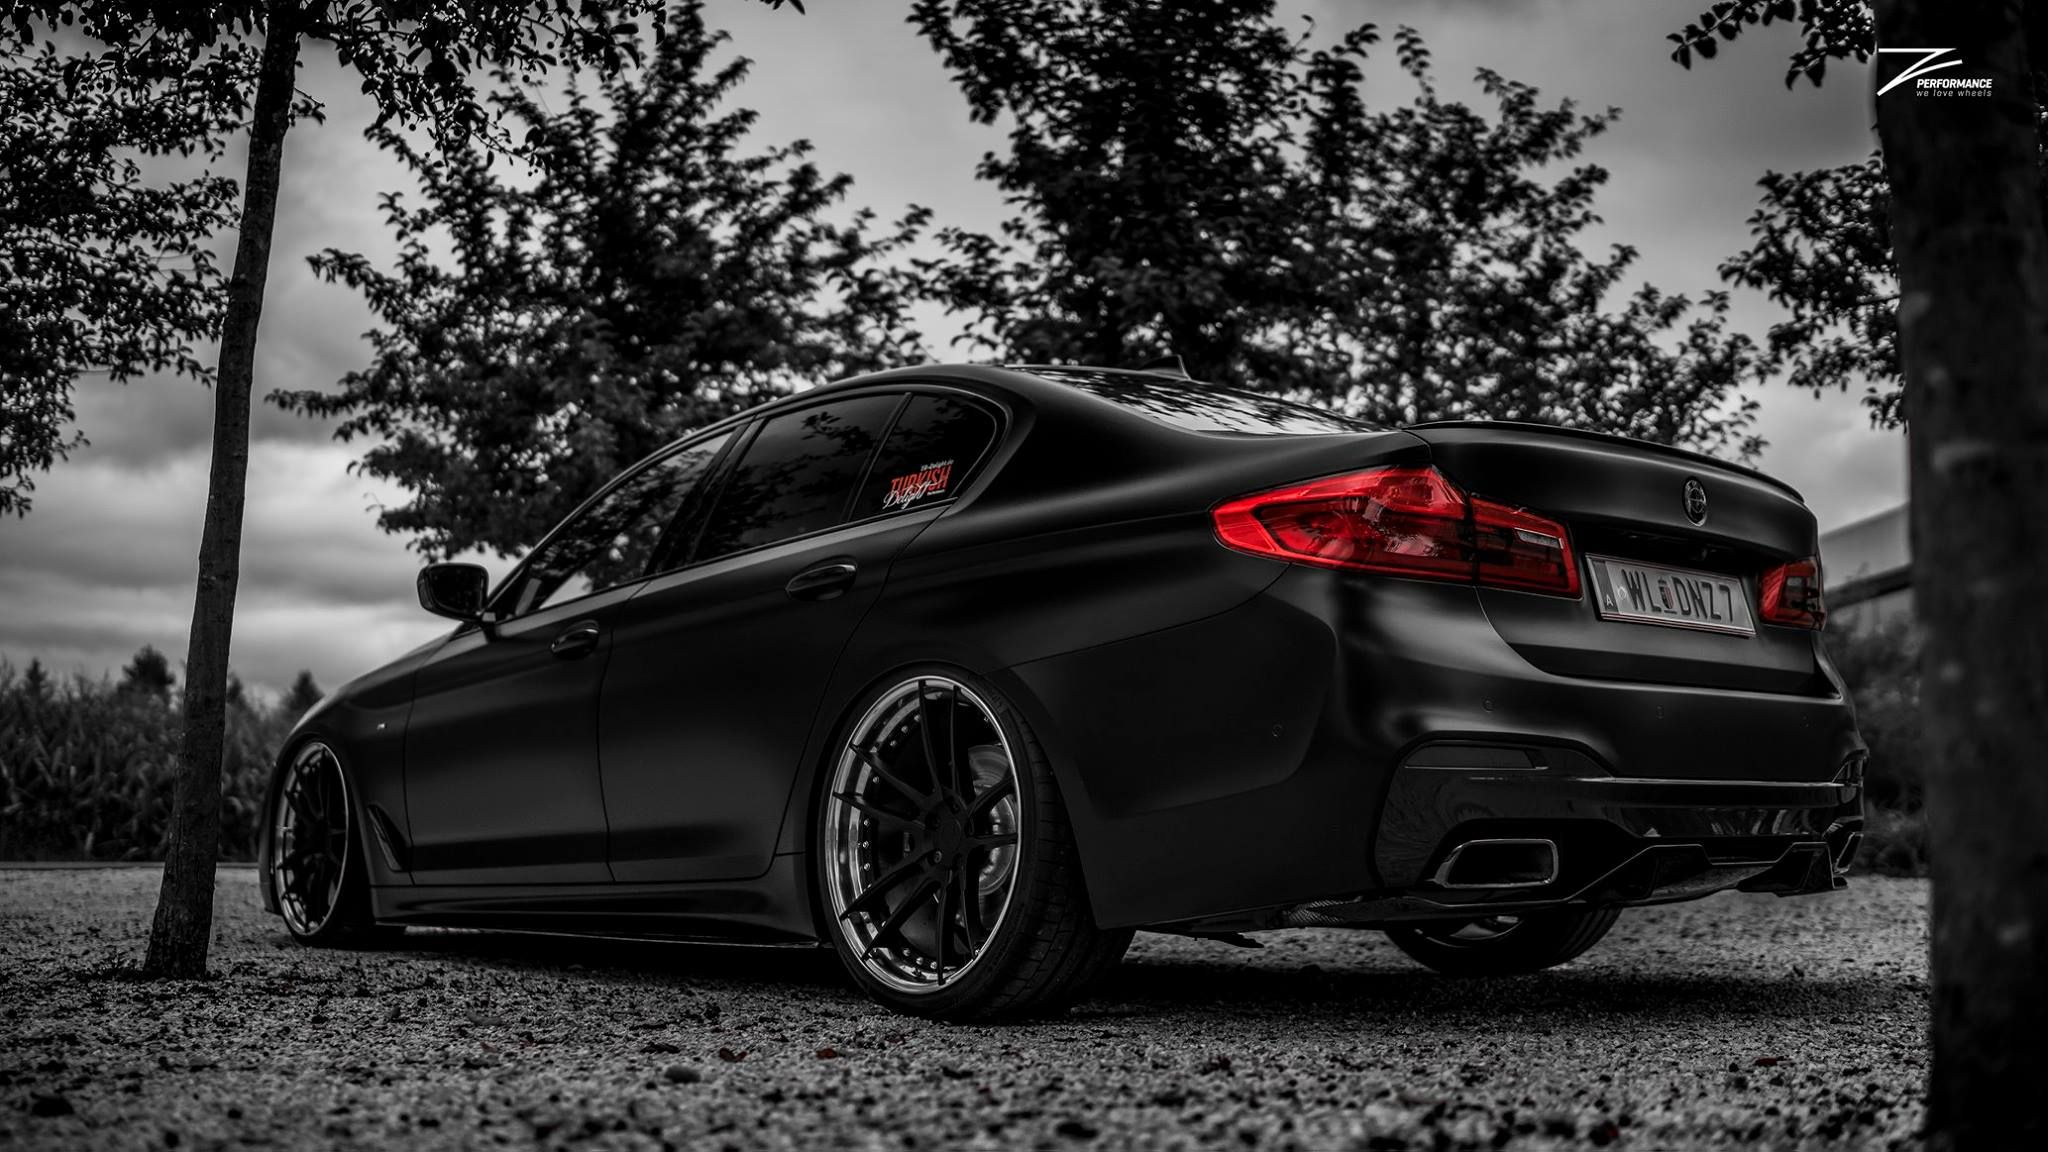 BMW G30 530i Sedan xDrive MPackage MPerformance